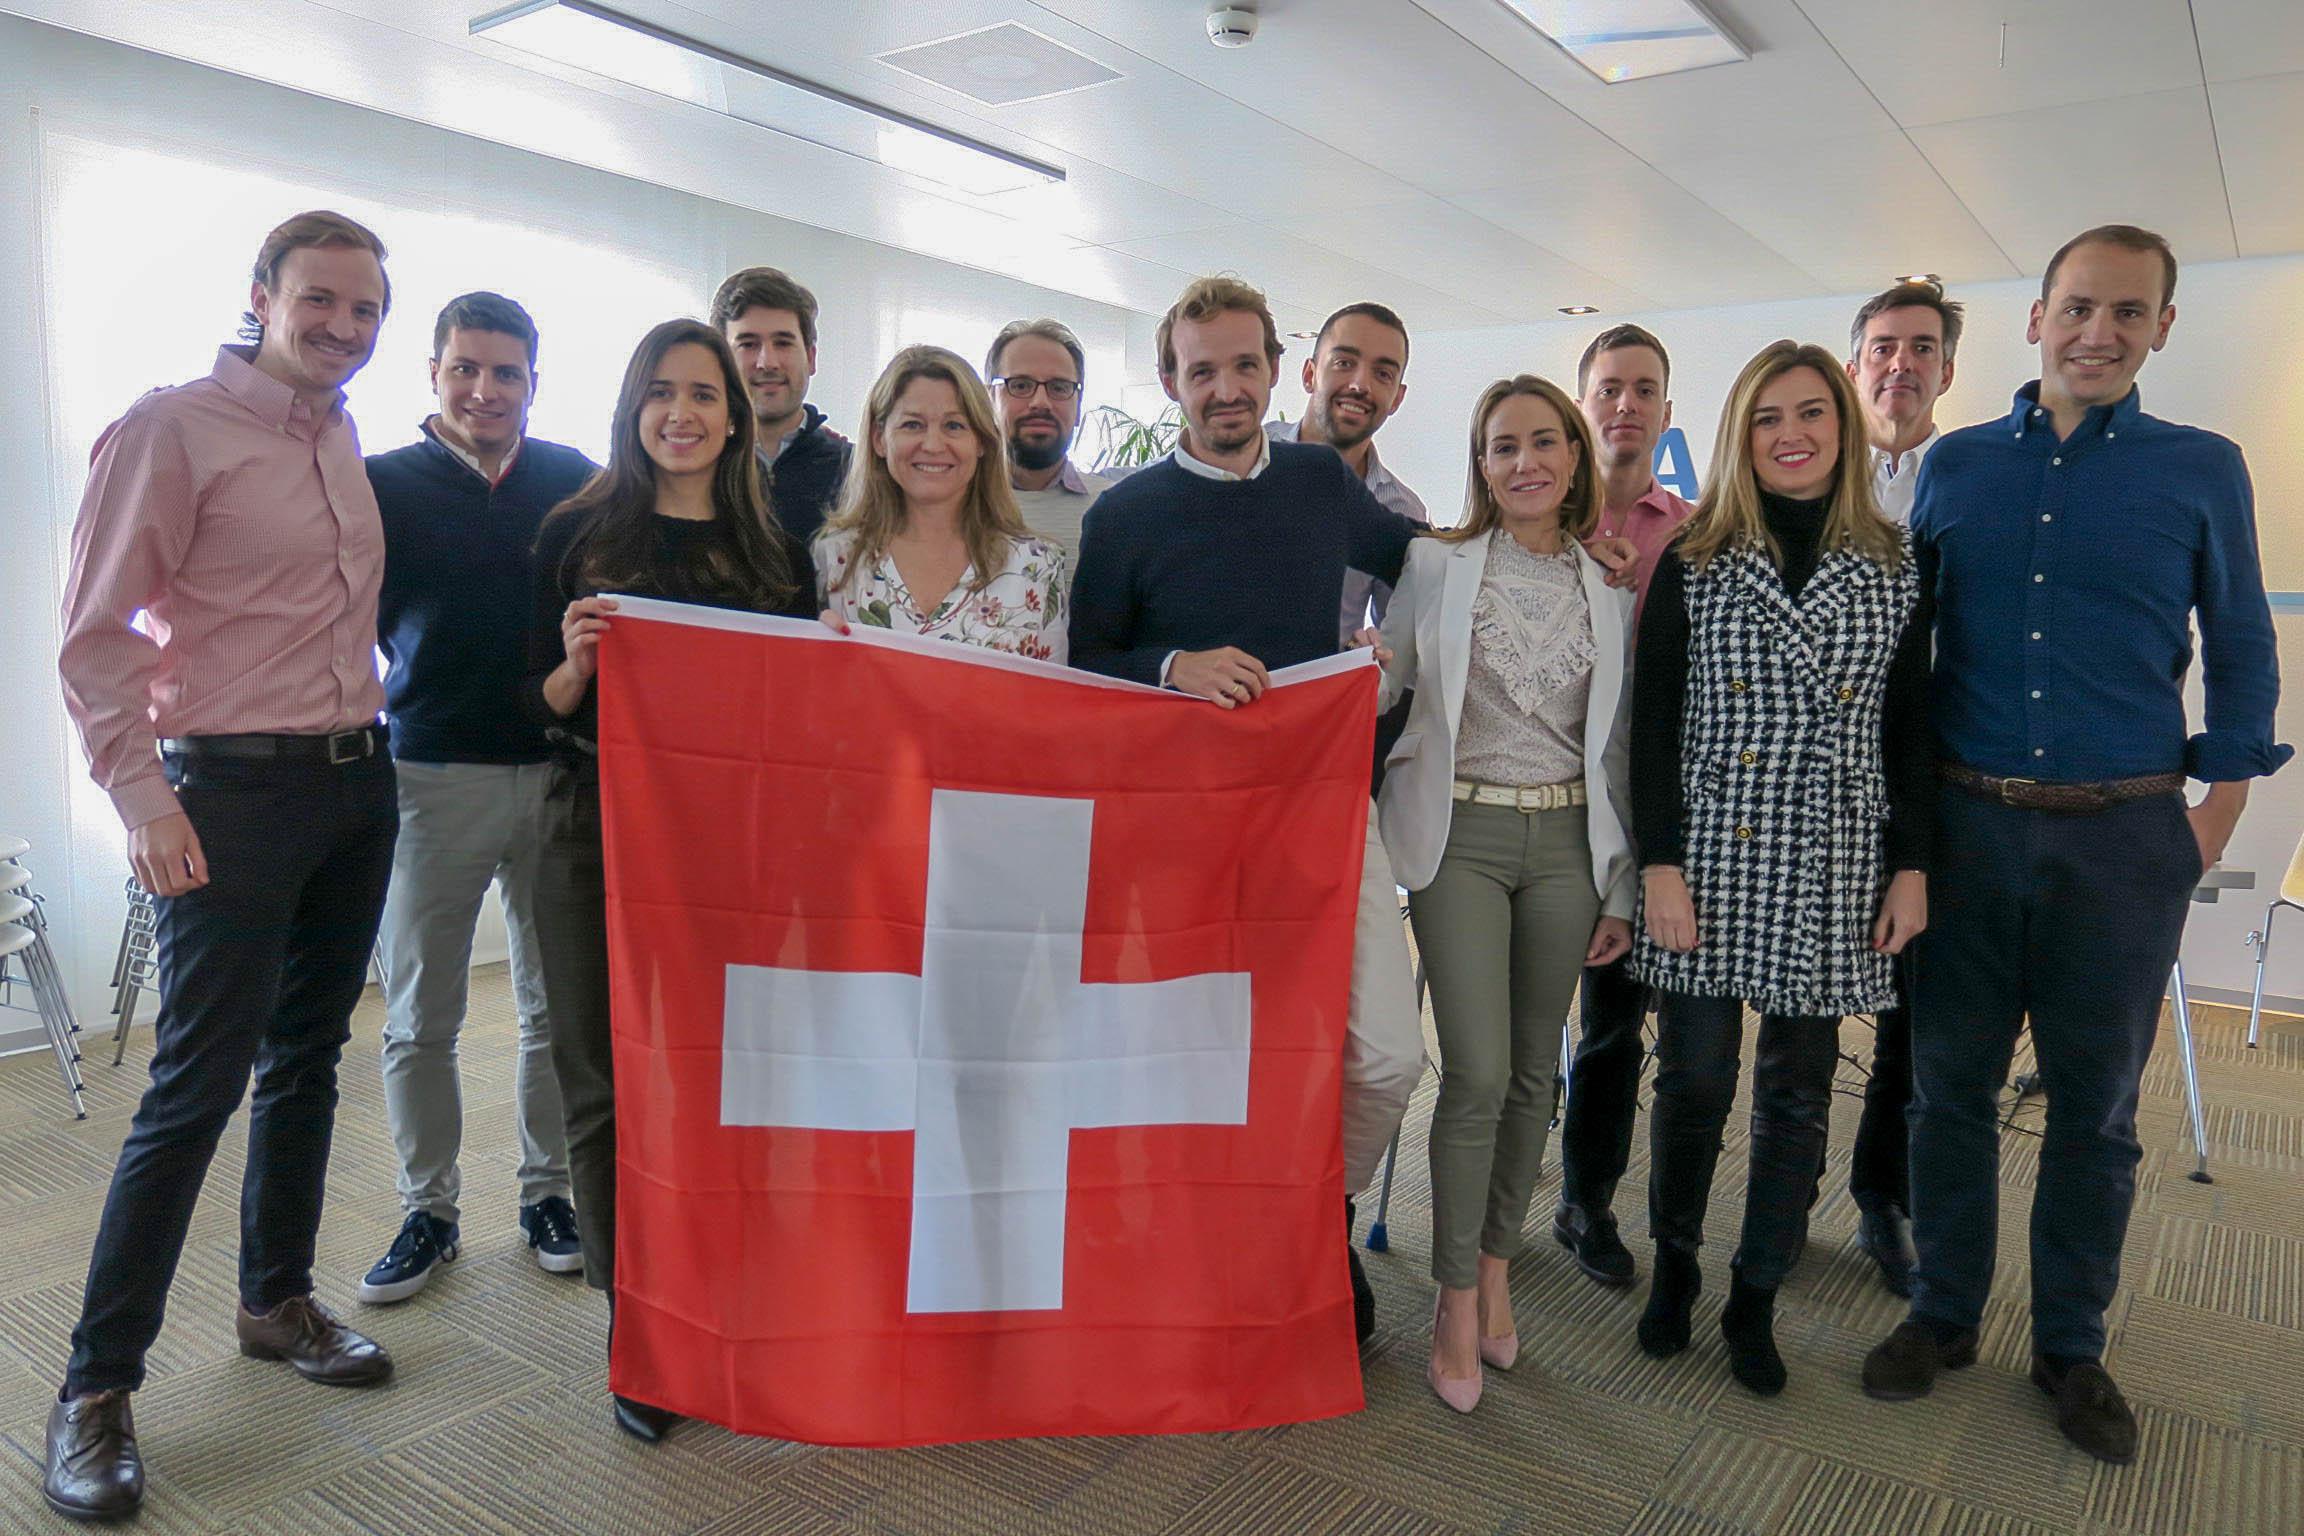 Discover BBVA's digital ambassadors in Switzerland